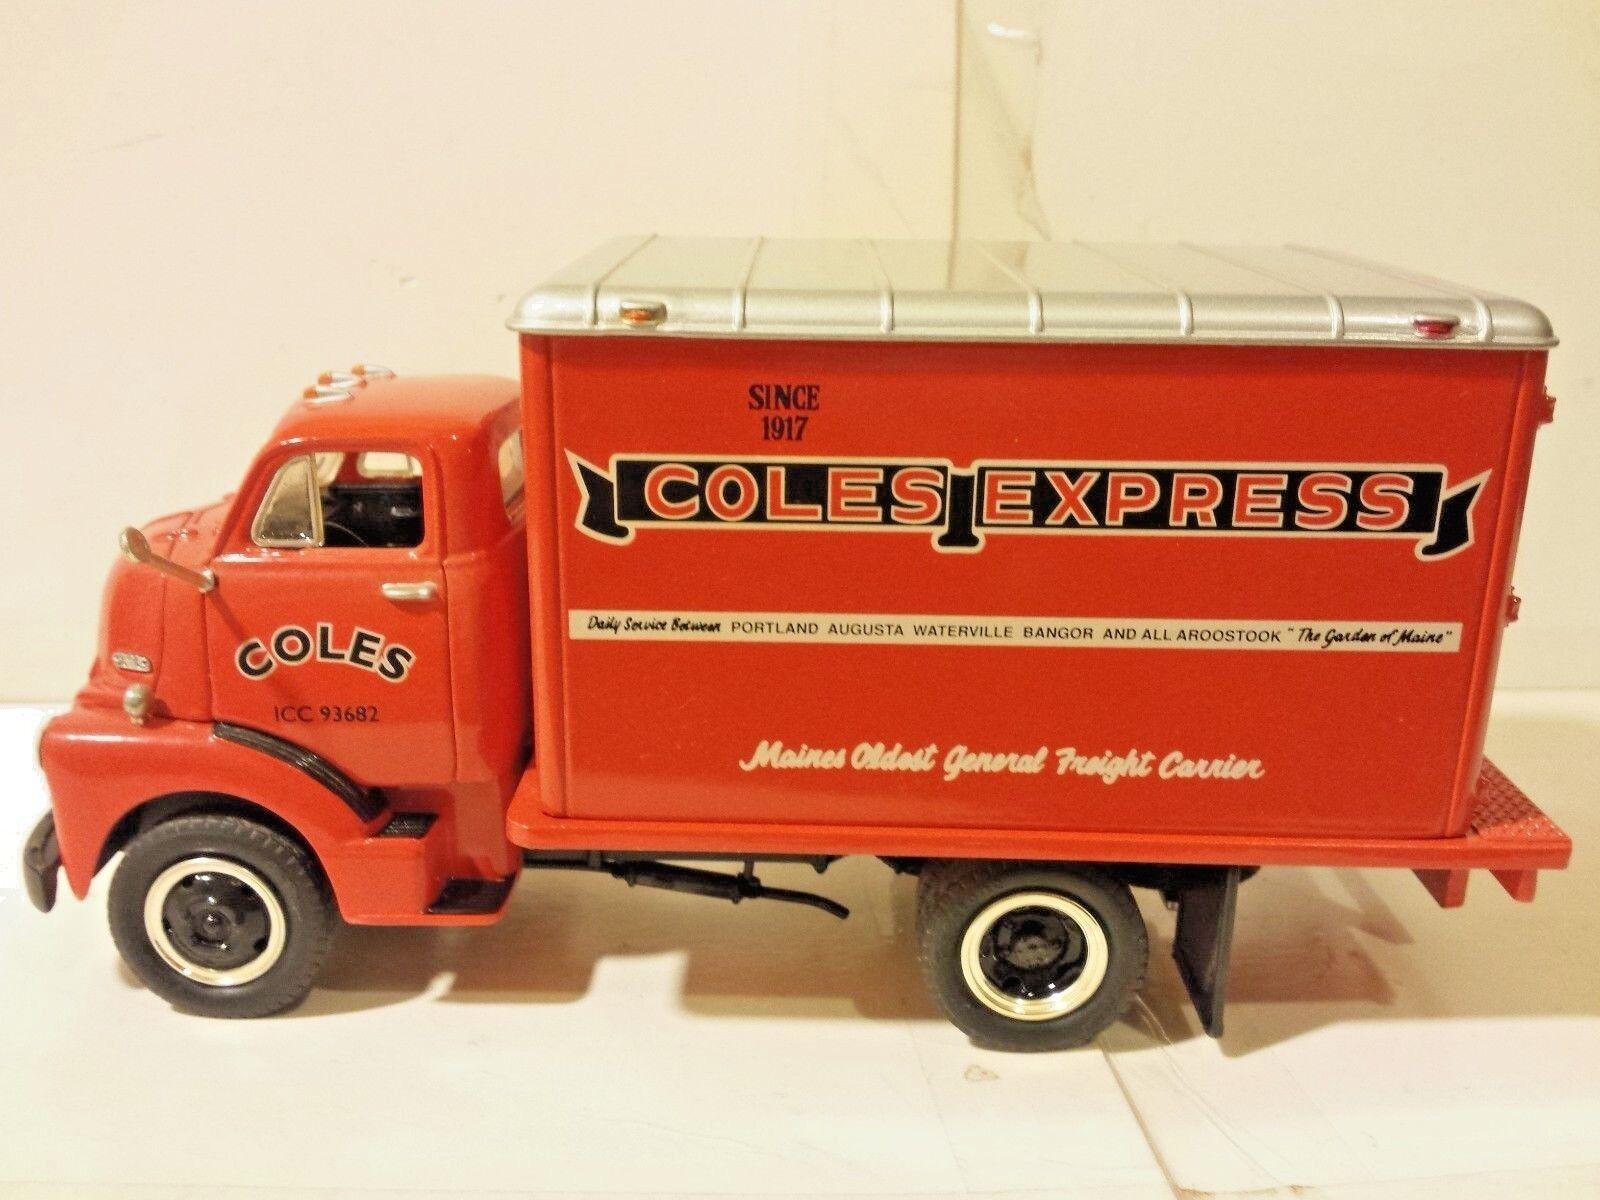 First First First Gear GMC 1952 Dry Goods Van 19-1031 Coles Express 1 34 Scale Die Cast ba4b6c